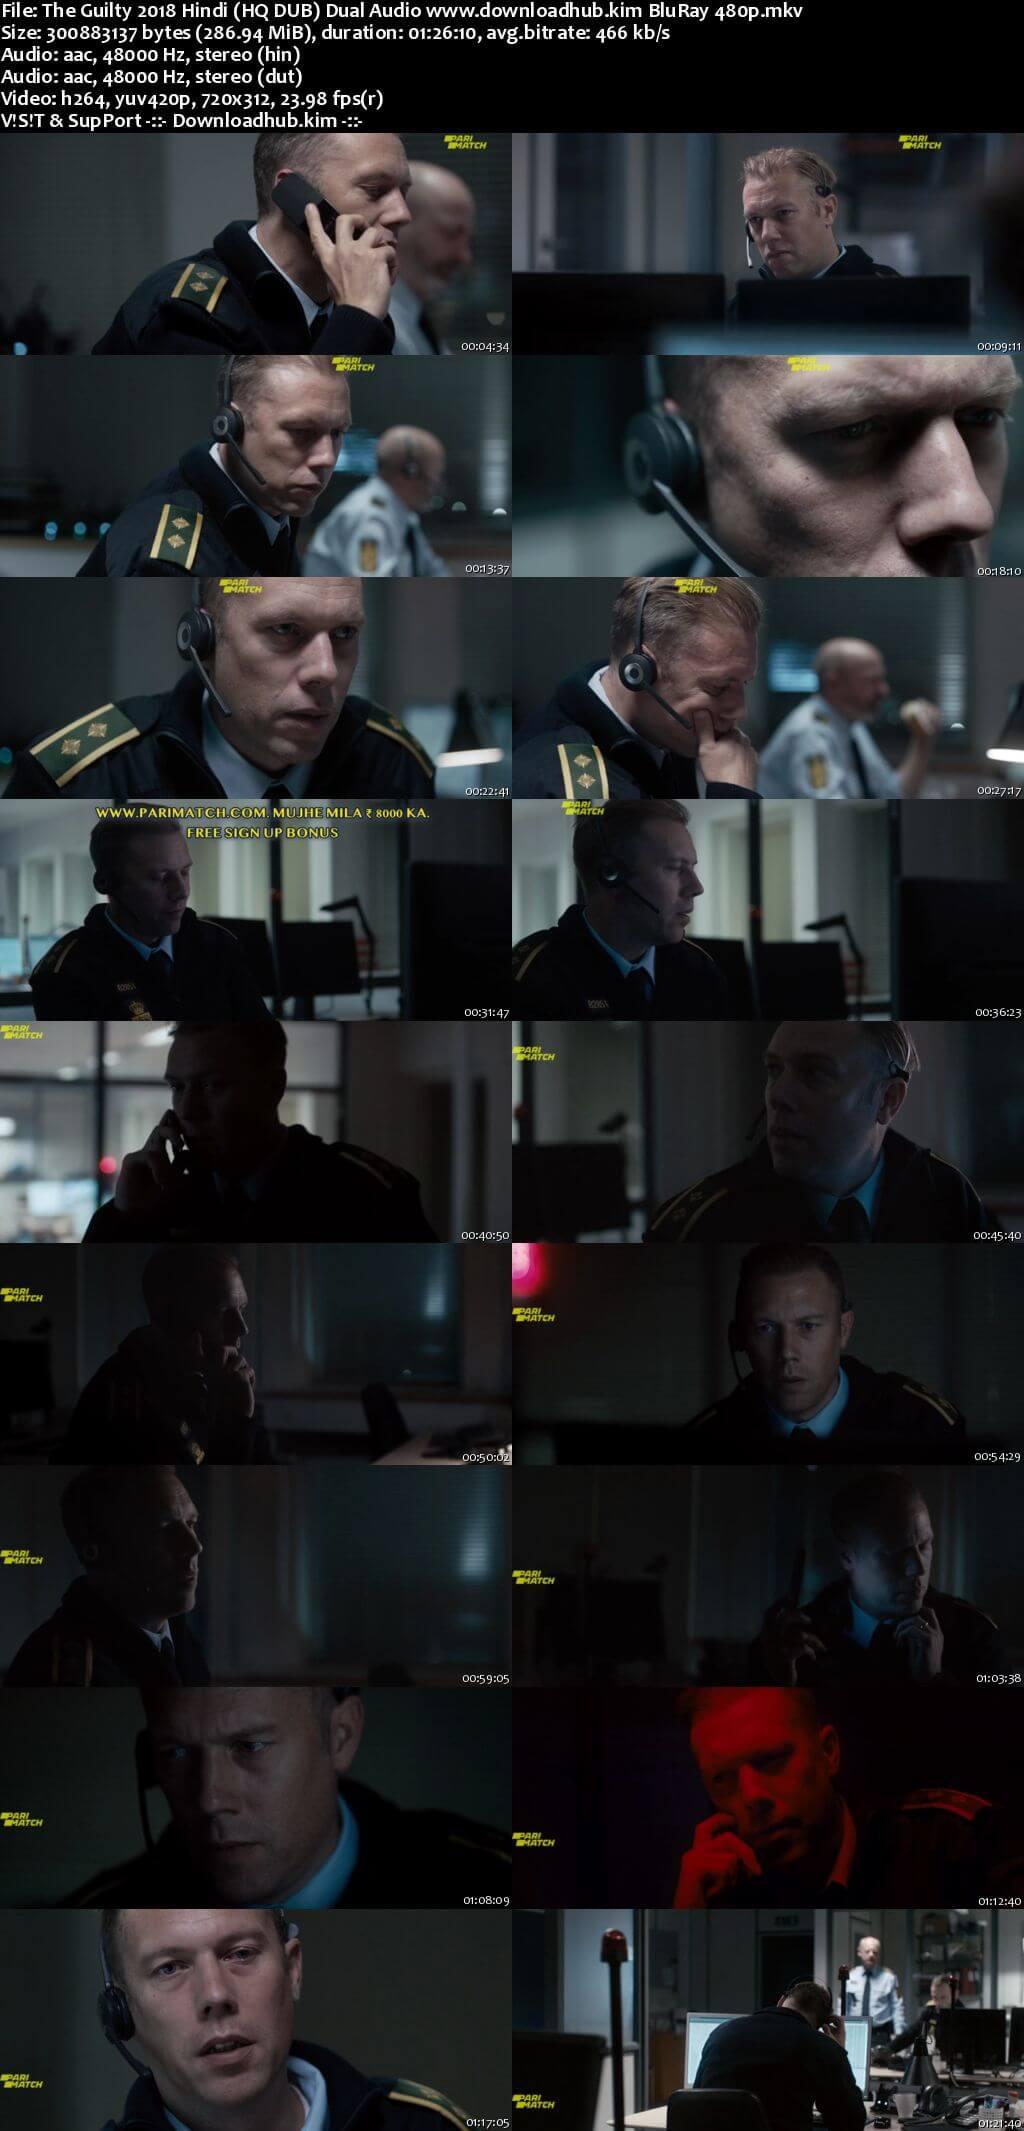 The Guilty 2018 Hindi (HQ DUB) Dual Audio 280MB BluRay 480p